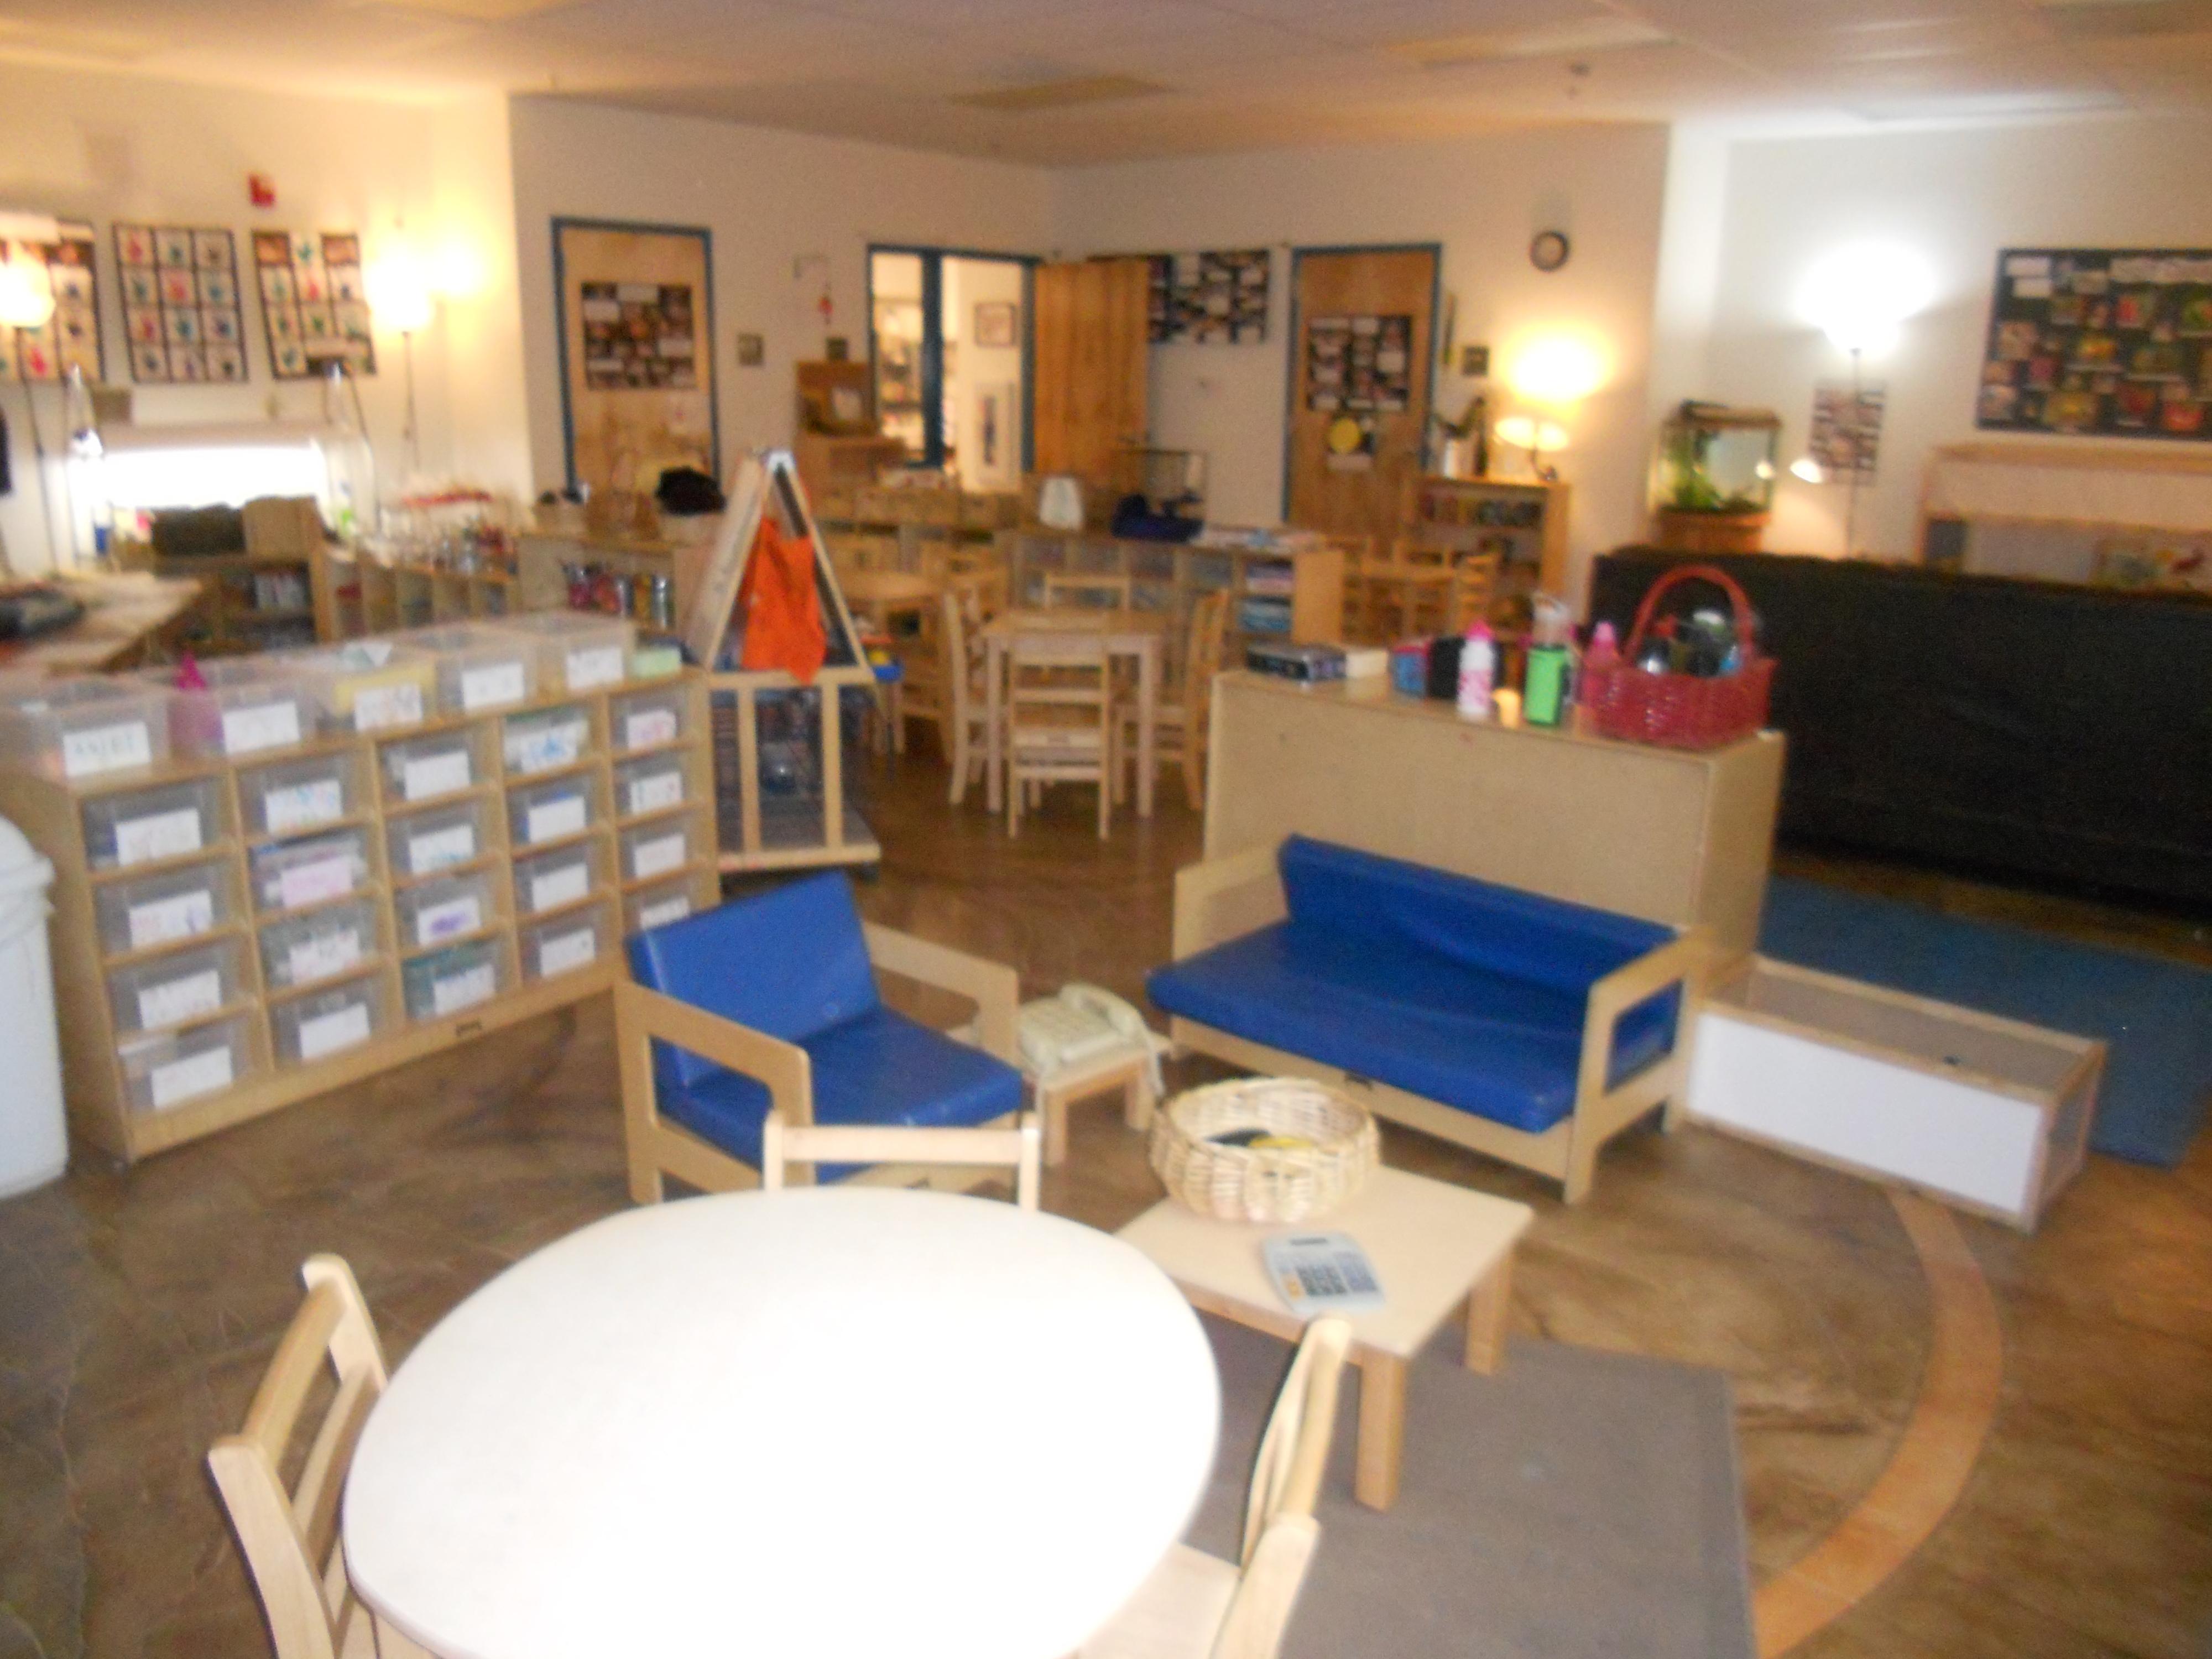 Preschool Environments